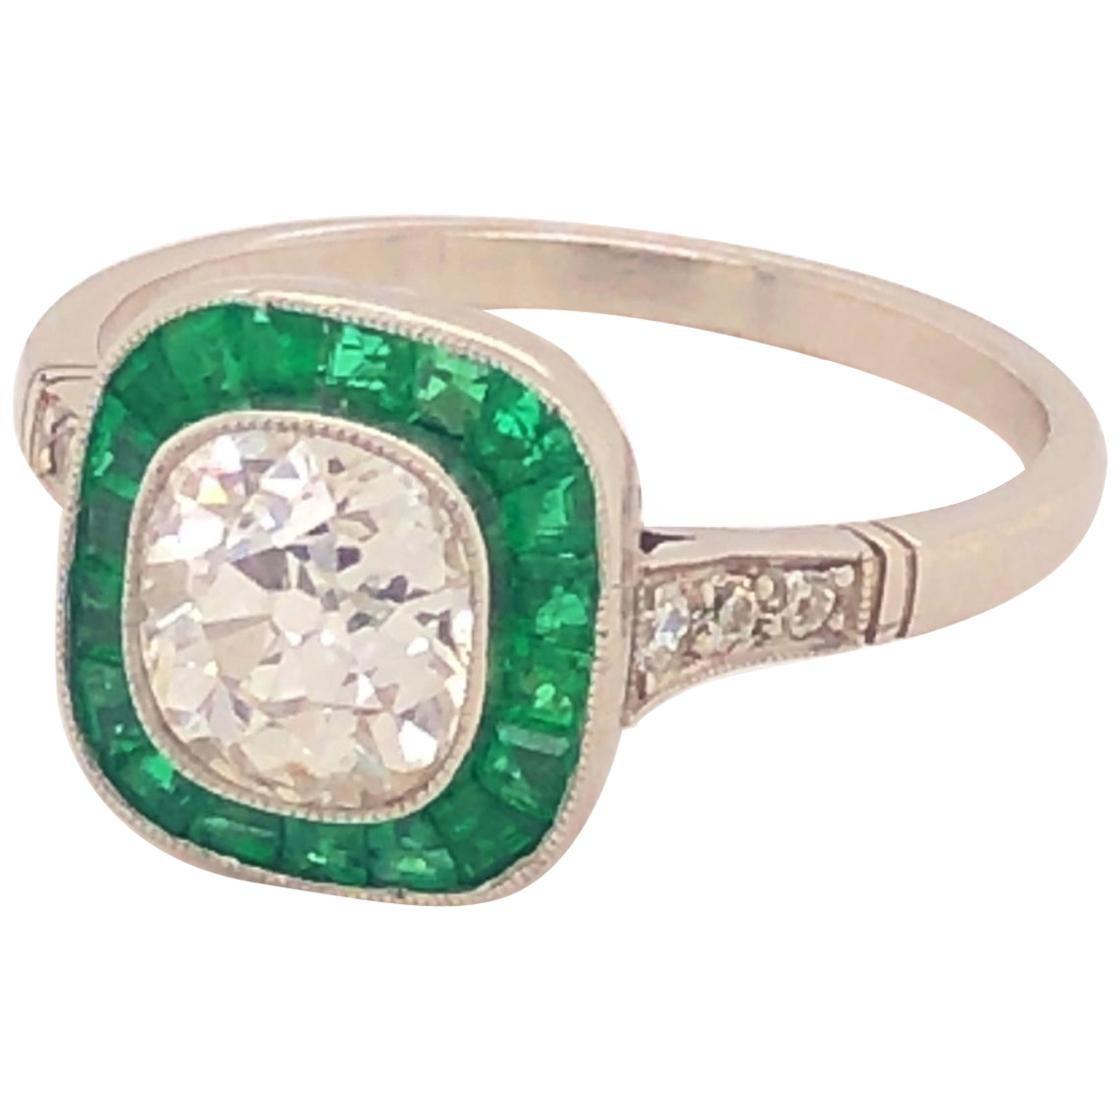 Art Deco Style 1.22 Old Mine Cushion Cut Diamond Emeralds Platinum Ring